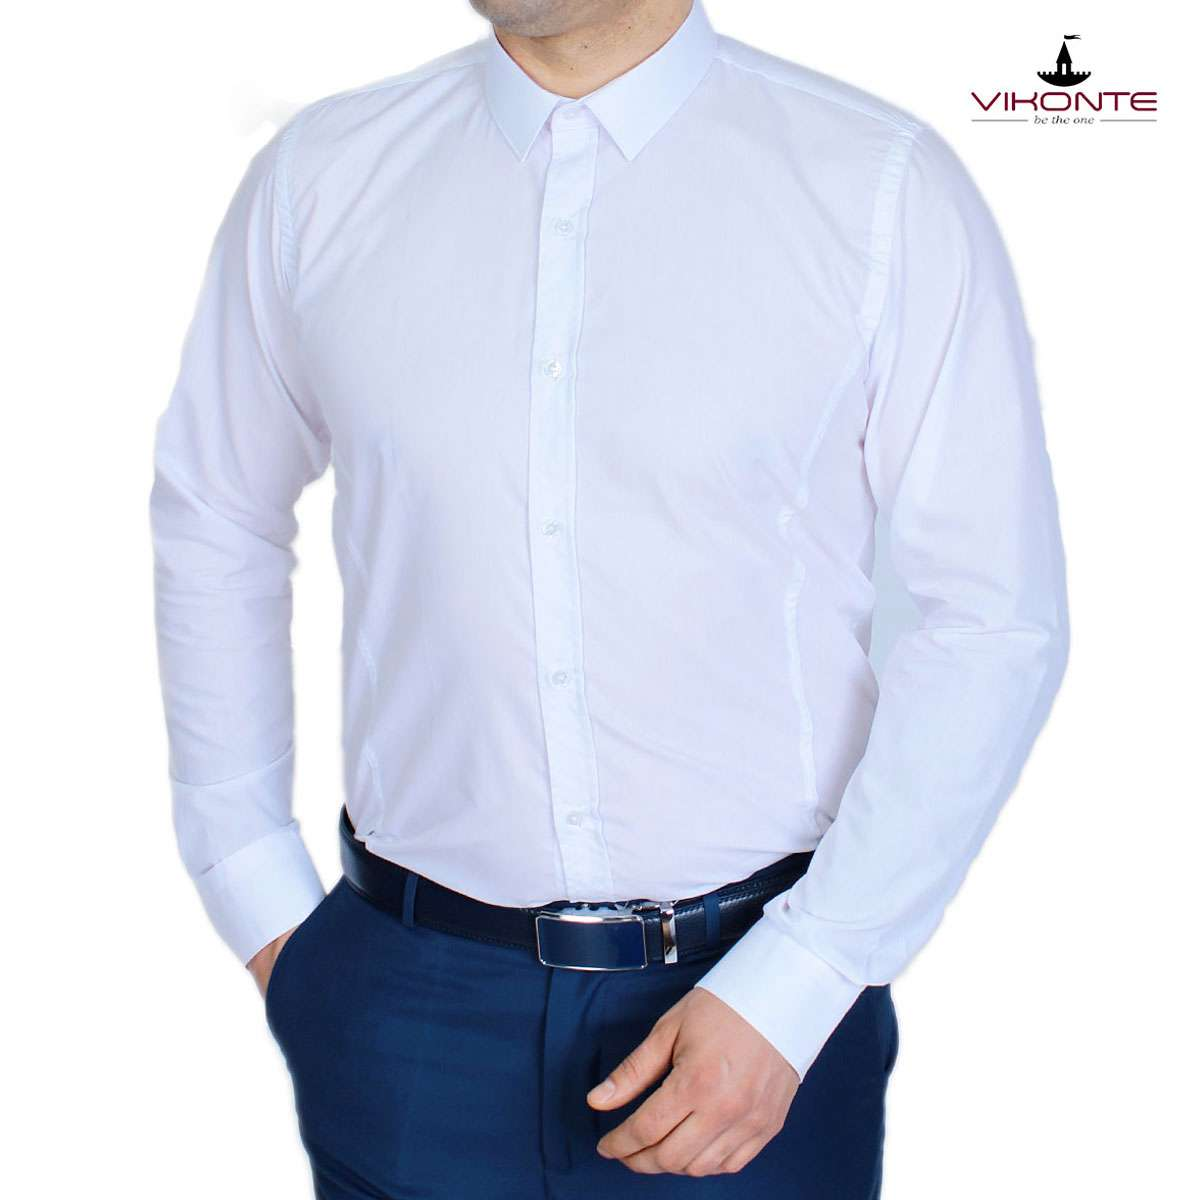 37537a4998e Бяла мъжка официална риза DL10061 - vikonte.eu